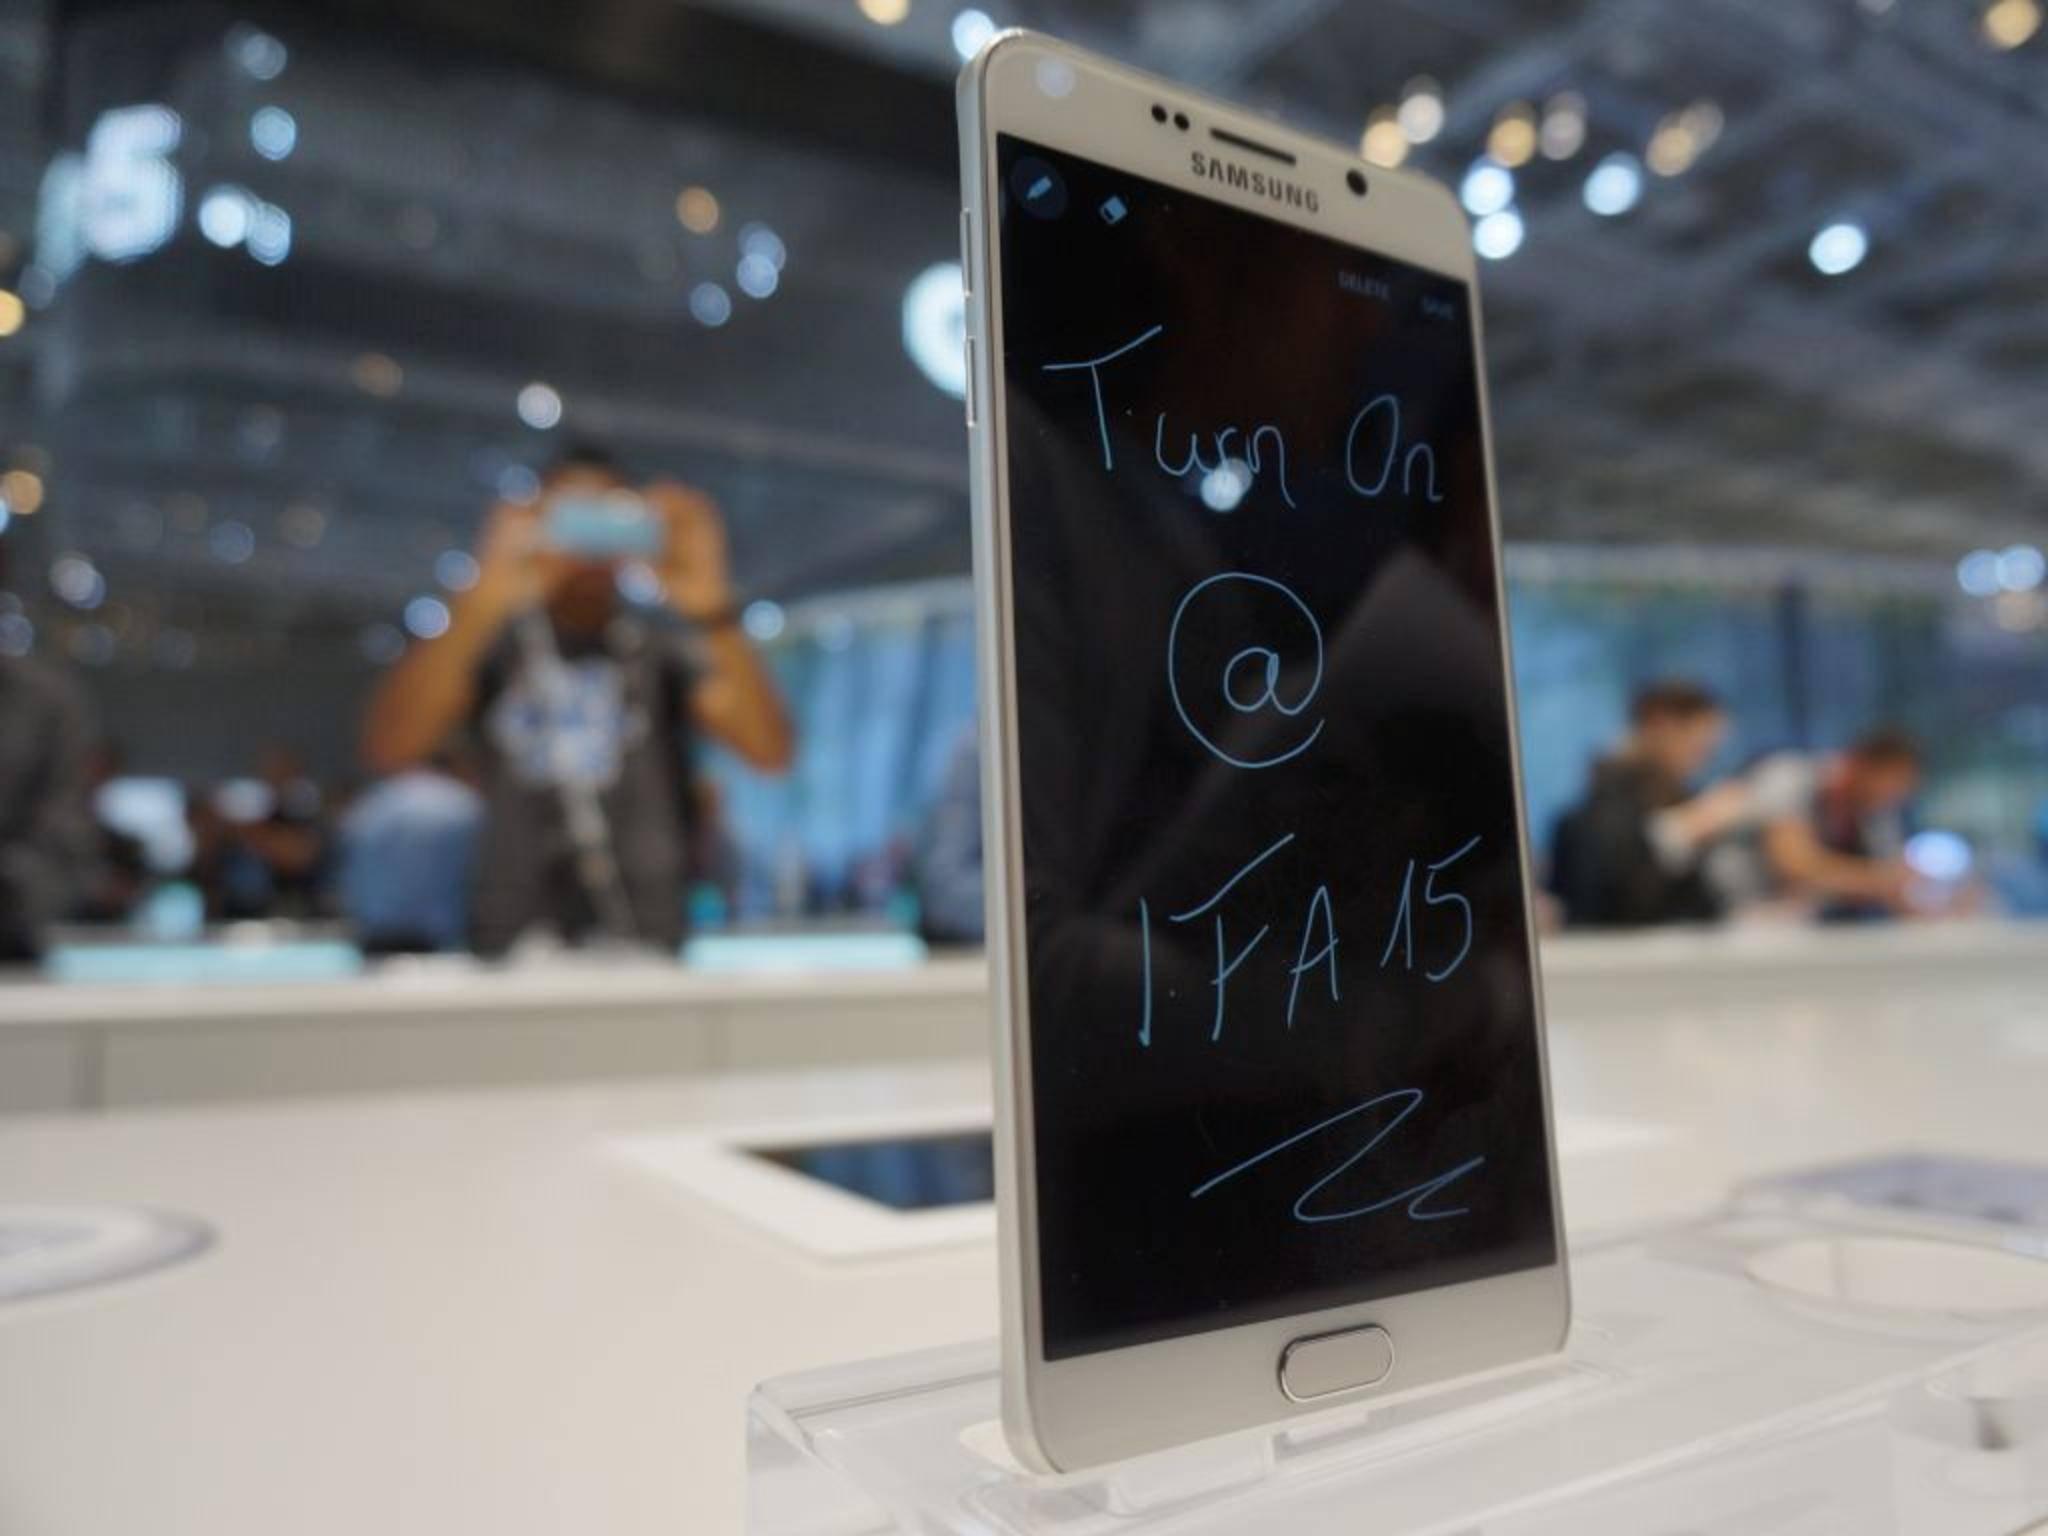 Nach dem Galaxy Note 5 folgt direkt das Galaxy Note 7.